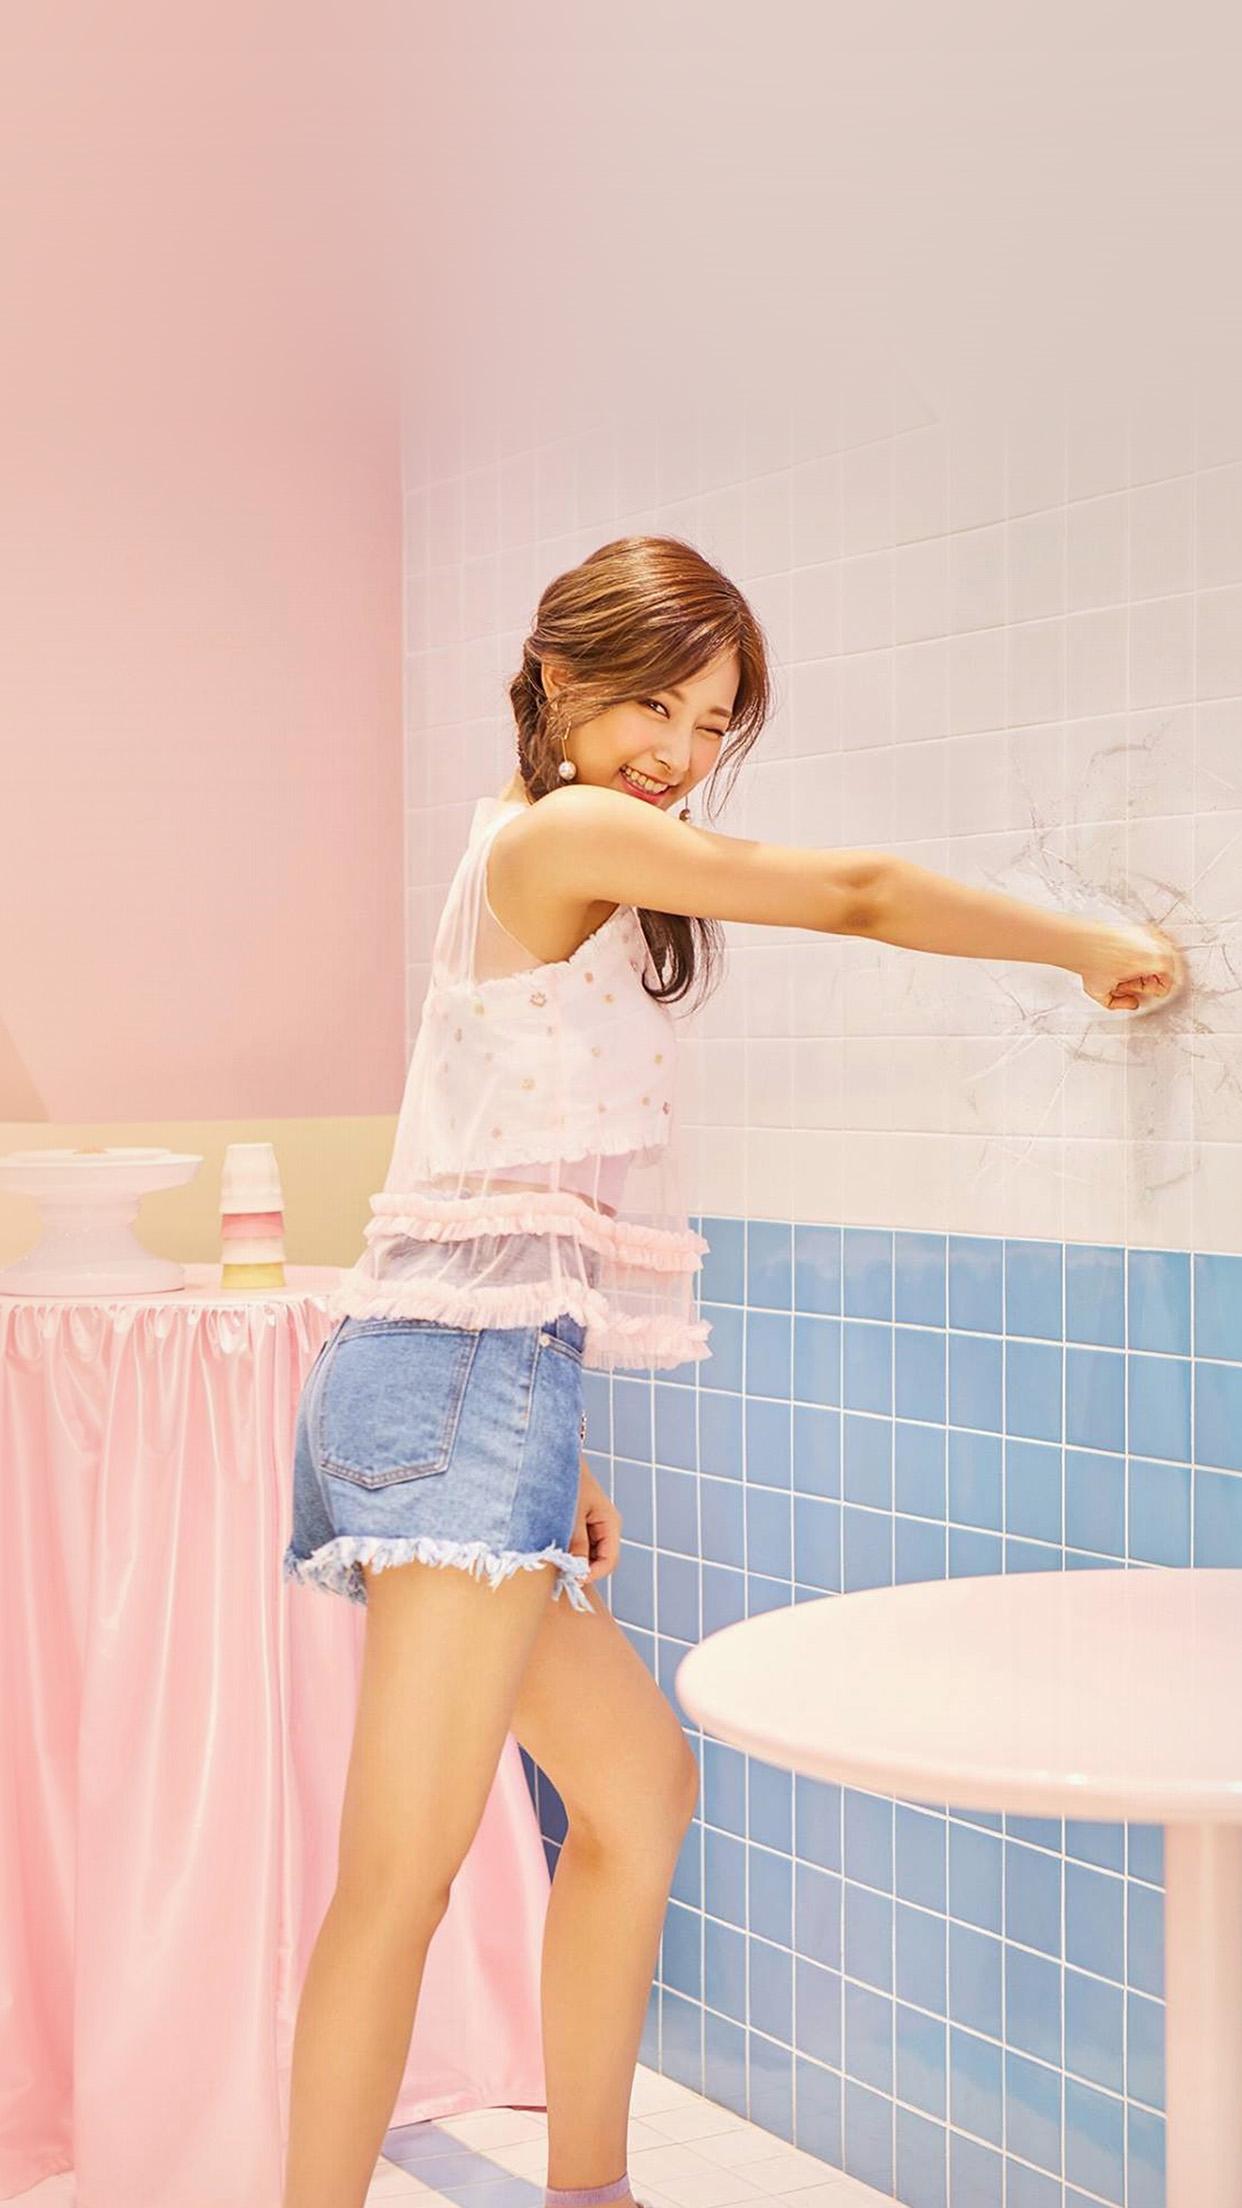 Hn09 tzuyu kpop twice girl cute pink wallpaper - 4k girl wallpaper for iphone ...